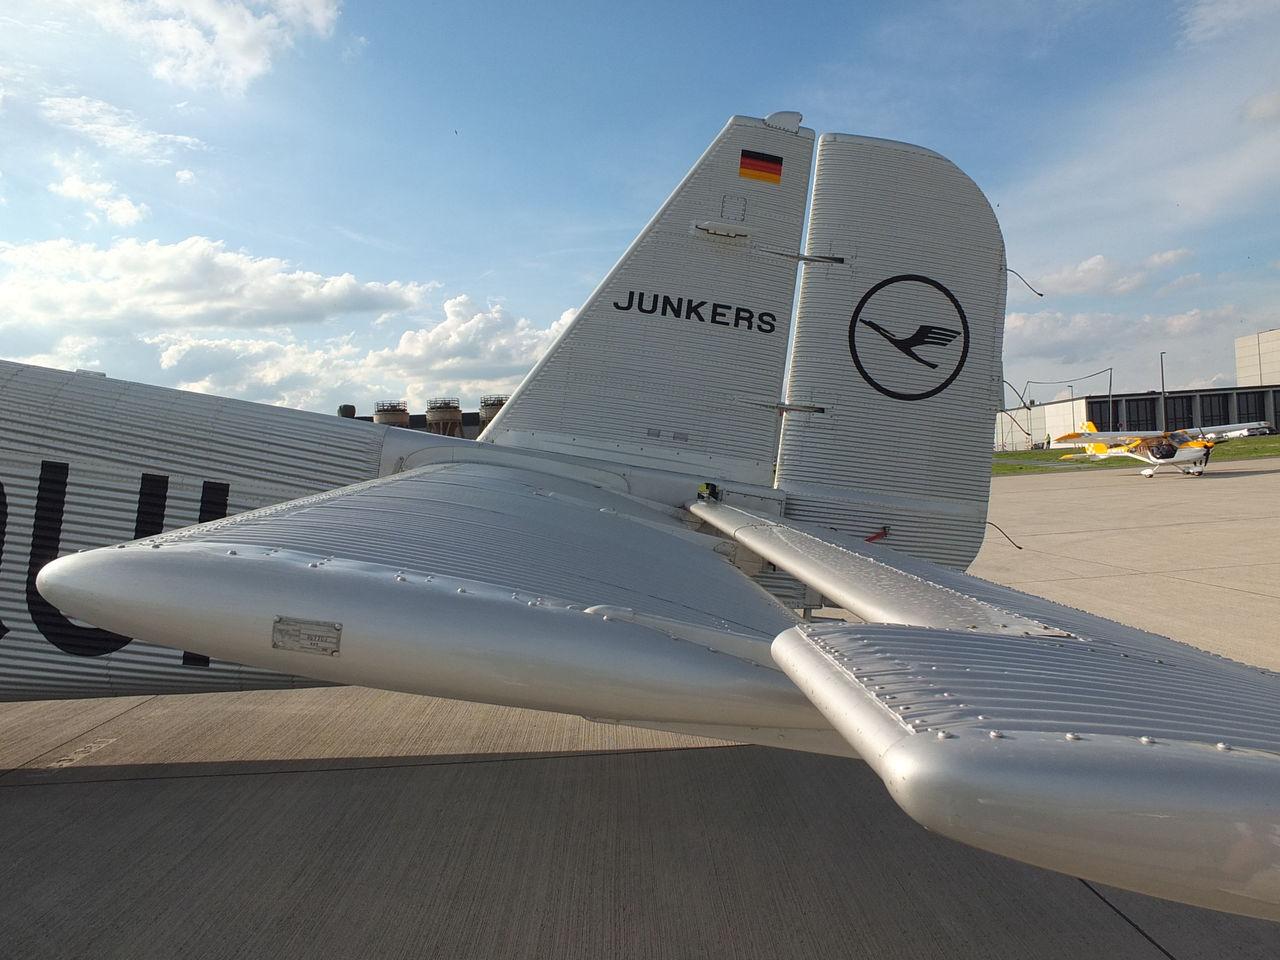 Самолет Юнкерс Ю-52 авиакомпании Люфтганза